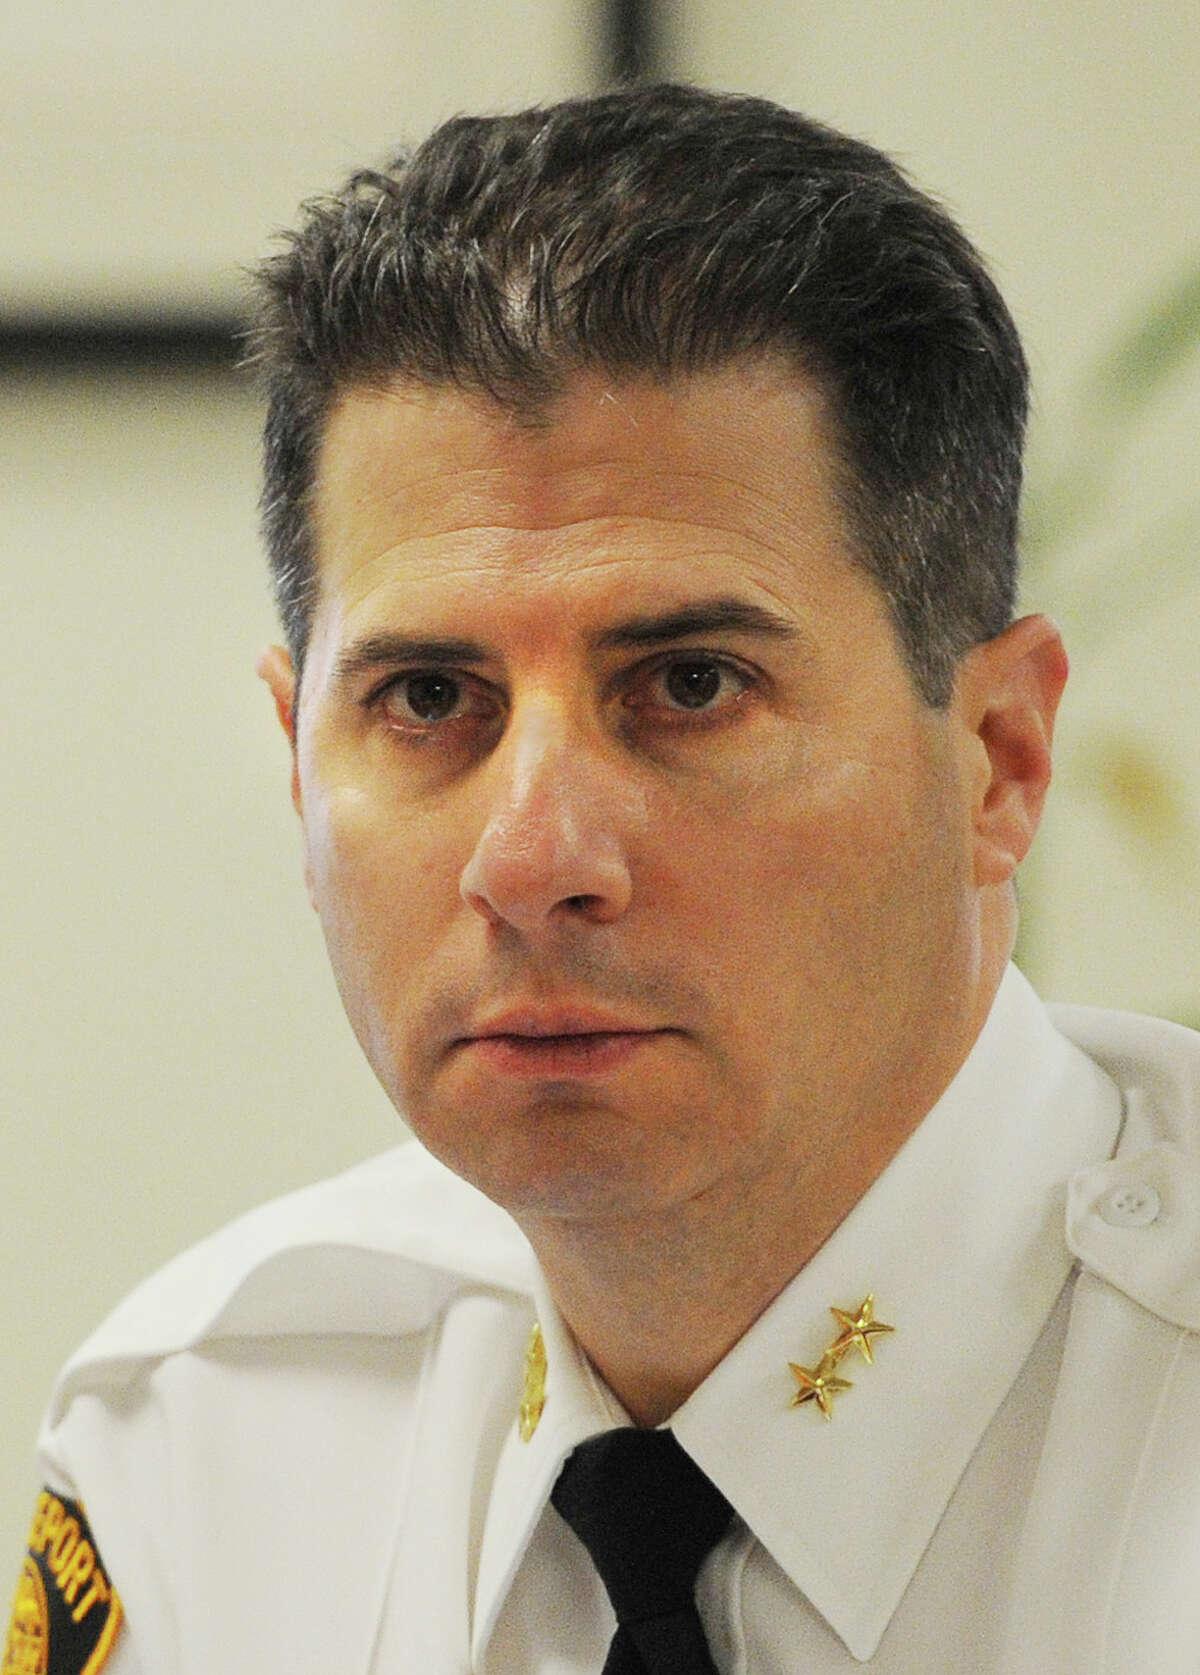 Bridgeport Assistant Police Chief James Nardozzi's $123,420 position has been eliminated by Mayor Joe Ganim.